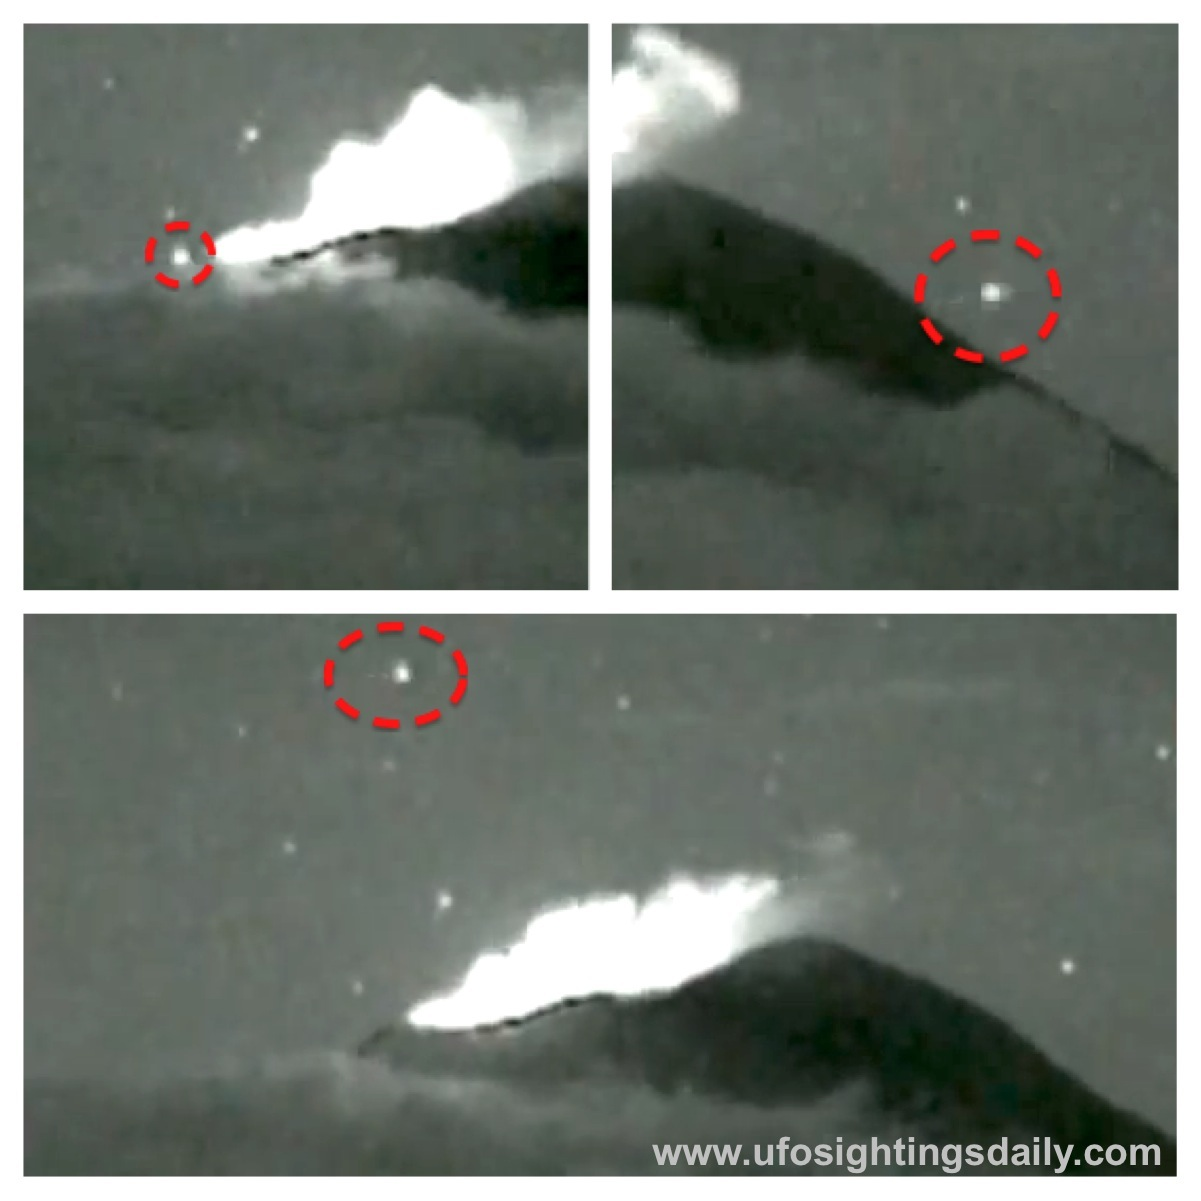 http://4.bp.blogspot.com/-FWyYcV6uOKc/UHzqSzfqrDI/AAAAAAAAIx4/AOpDToC0AMQ/s1600/UFO,+UFOs,+sighting,+sightings,+alien,+aliens,+orb,+orbs,+glowing,+Angelina+Jolie,+UN,+Oct,+2012,+Mexico,+volcano,+Popocatepetiovni.jpg